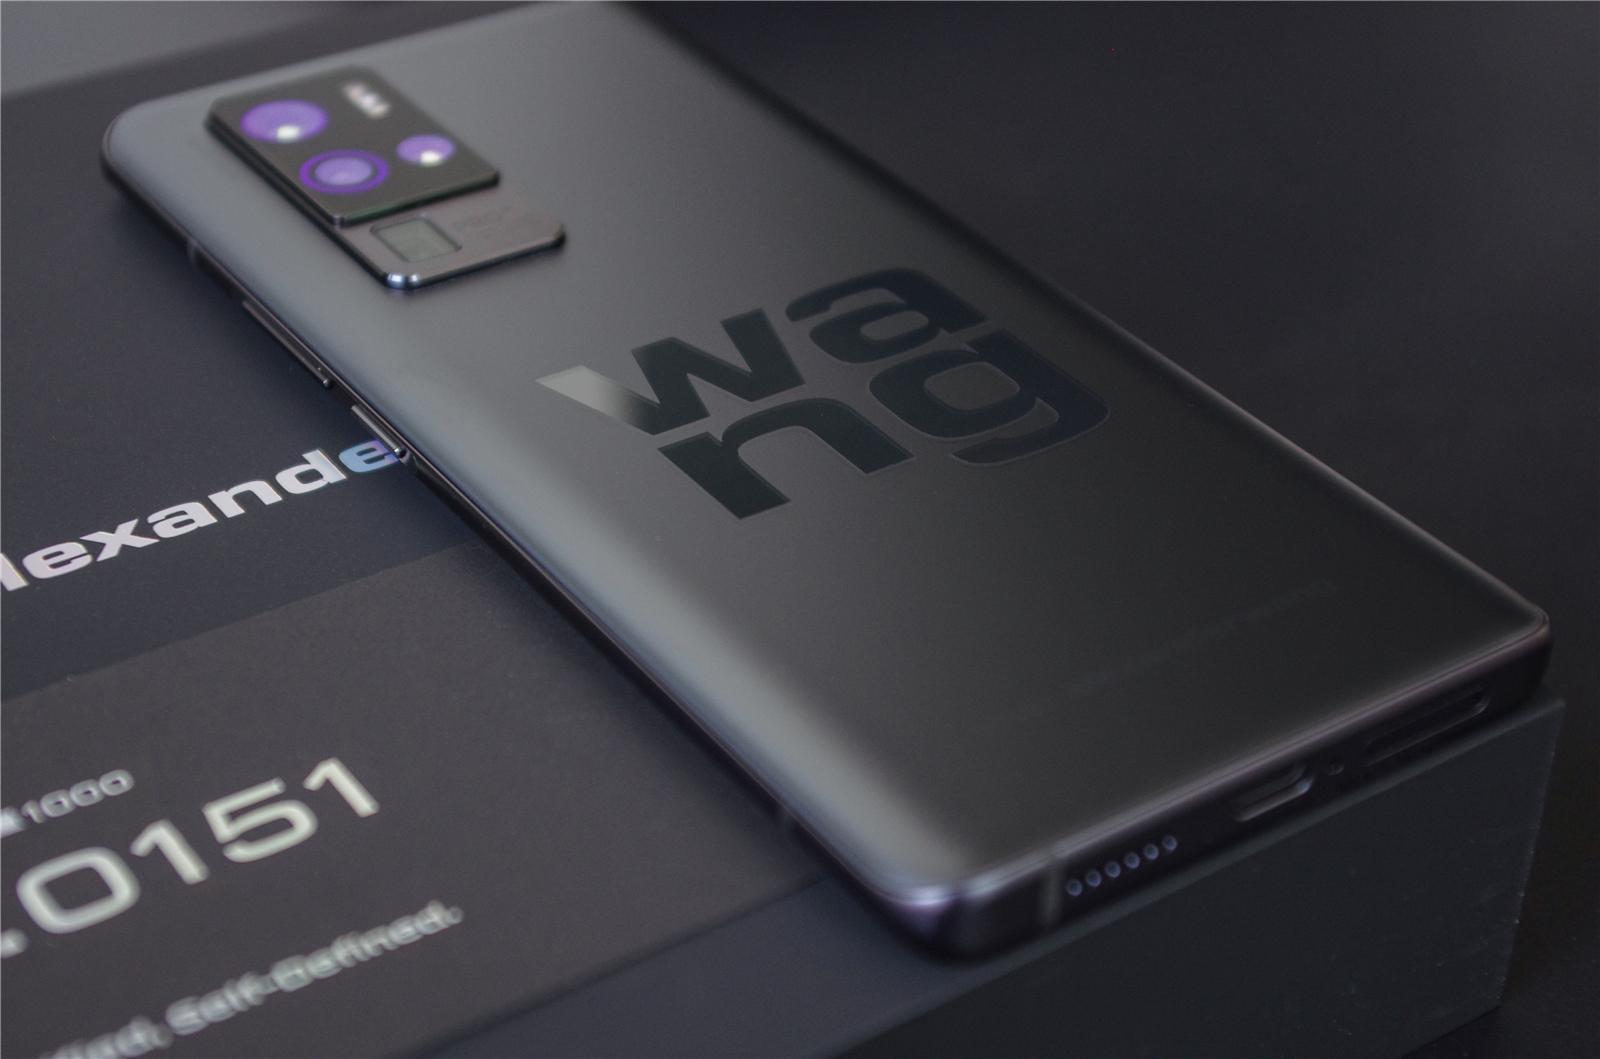 vivo X50 Pro+限定版体验:蓝厂颜值巅峰